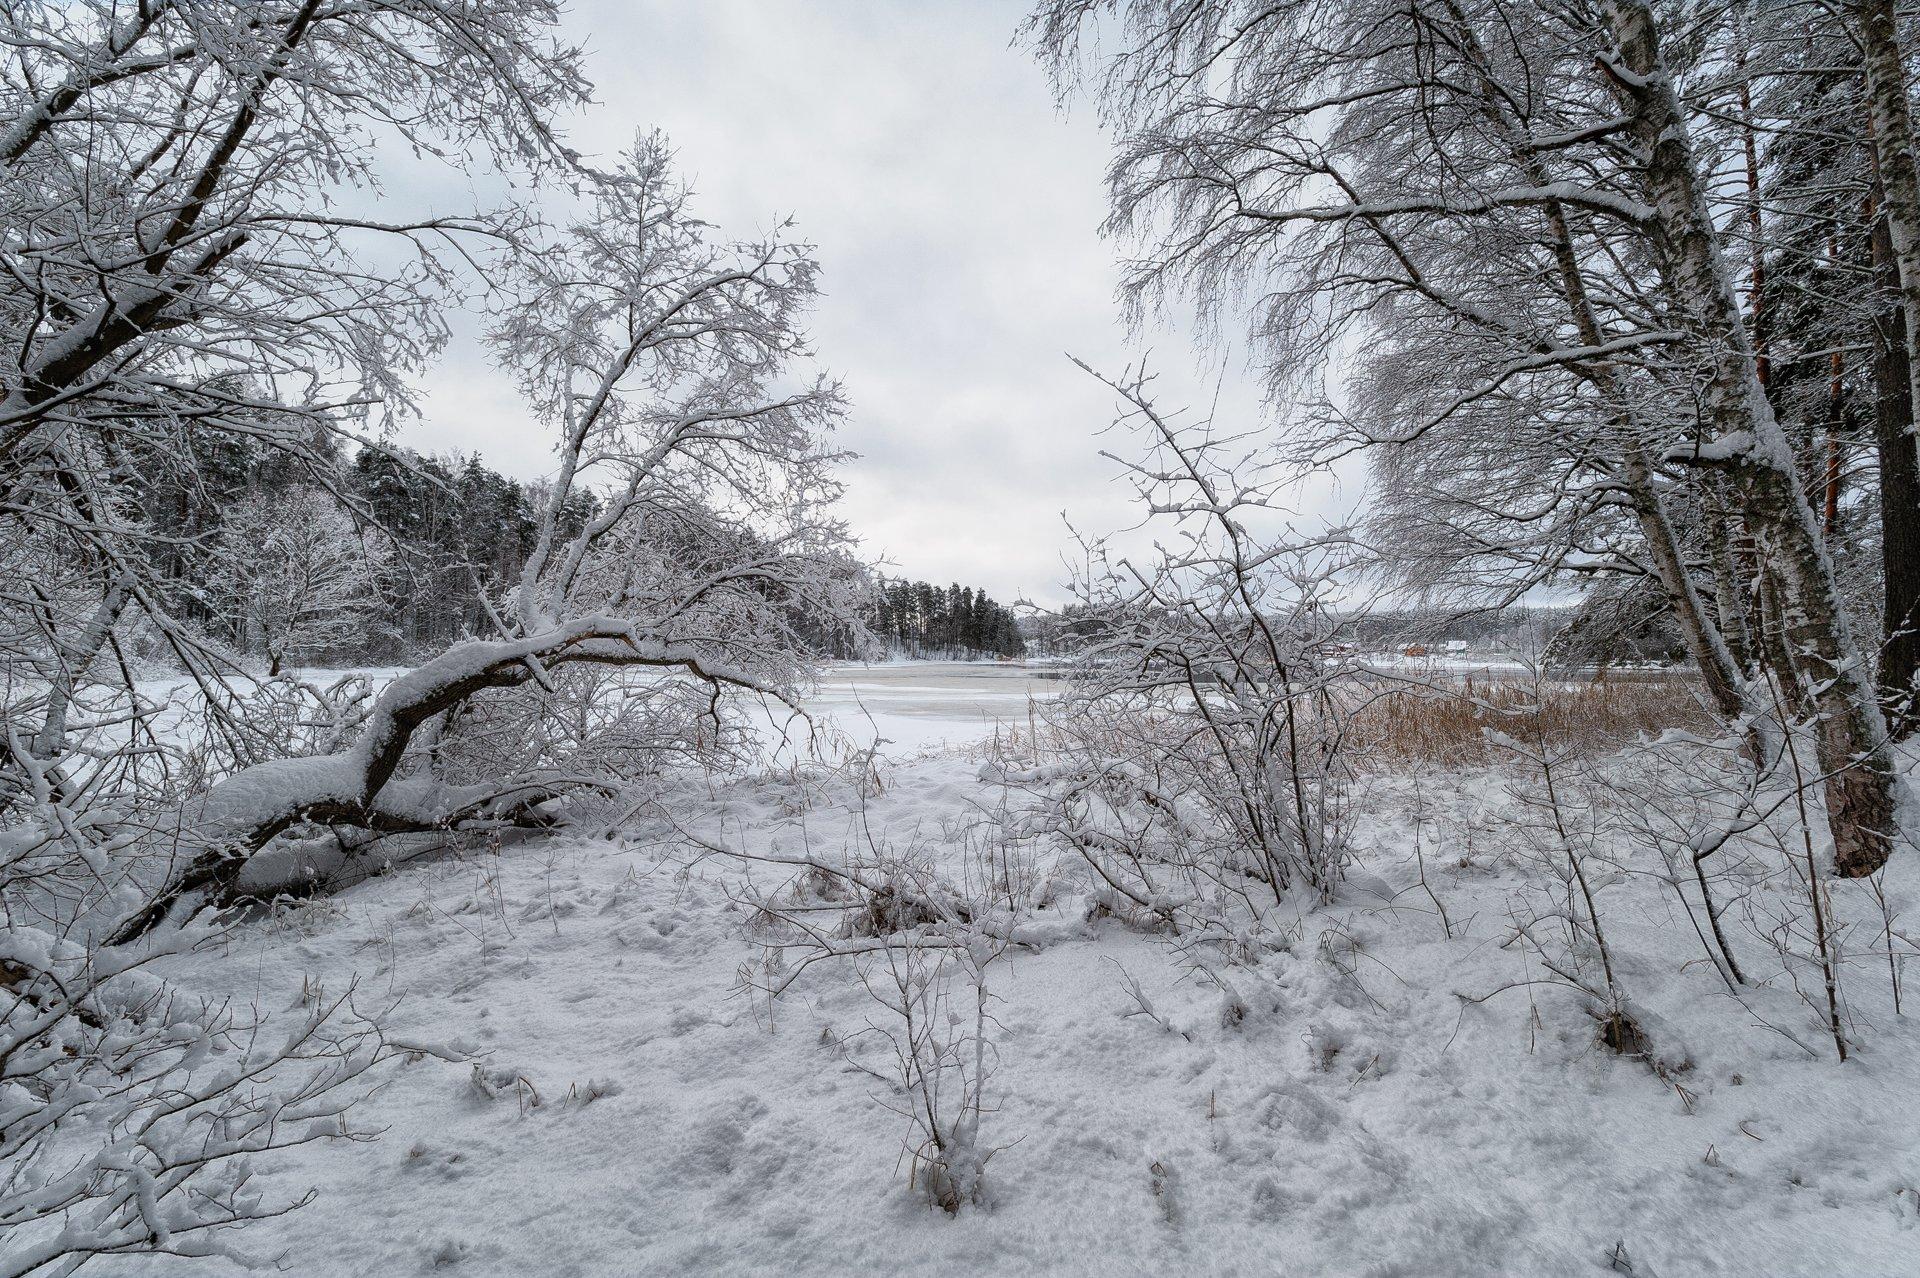 зима,снег,лед,река,вуокса,картина,берега,пейзаж, Евгений Плетнев